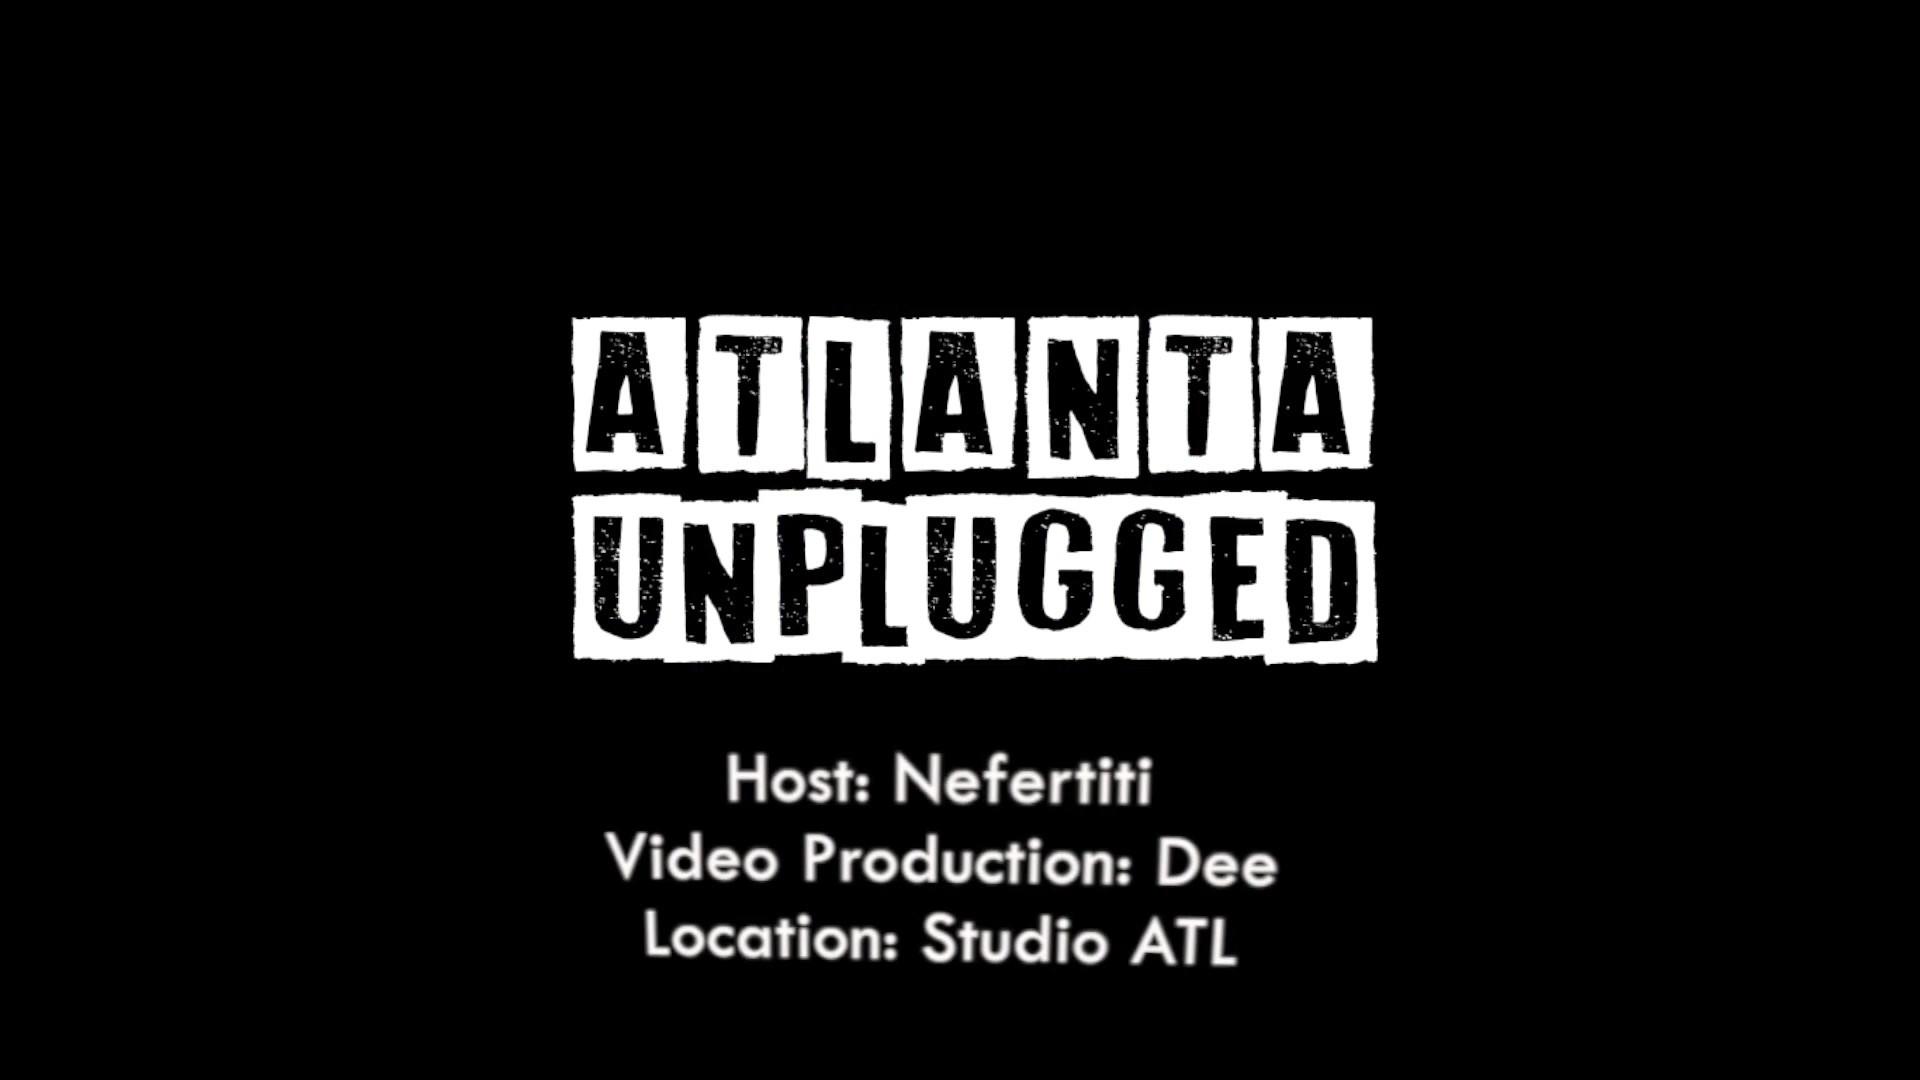 Atlanta Unplugged